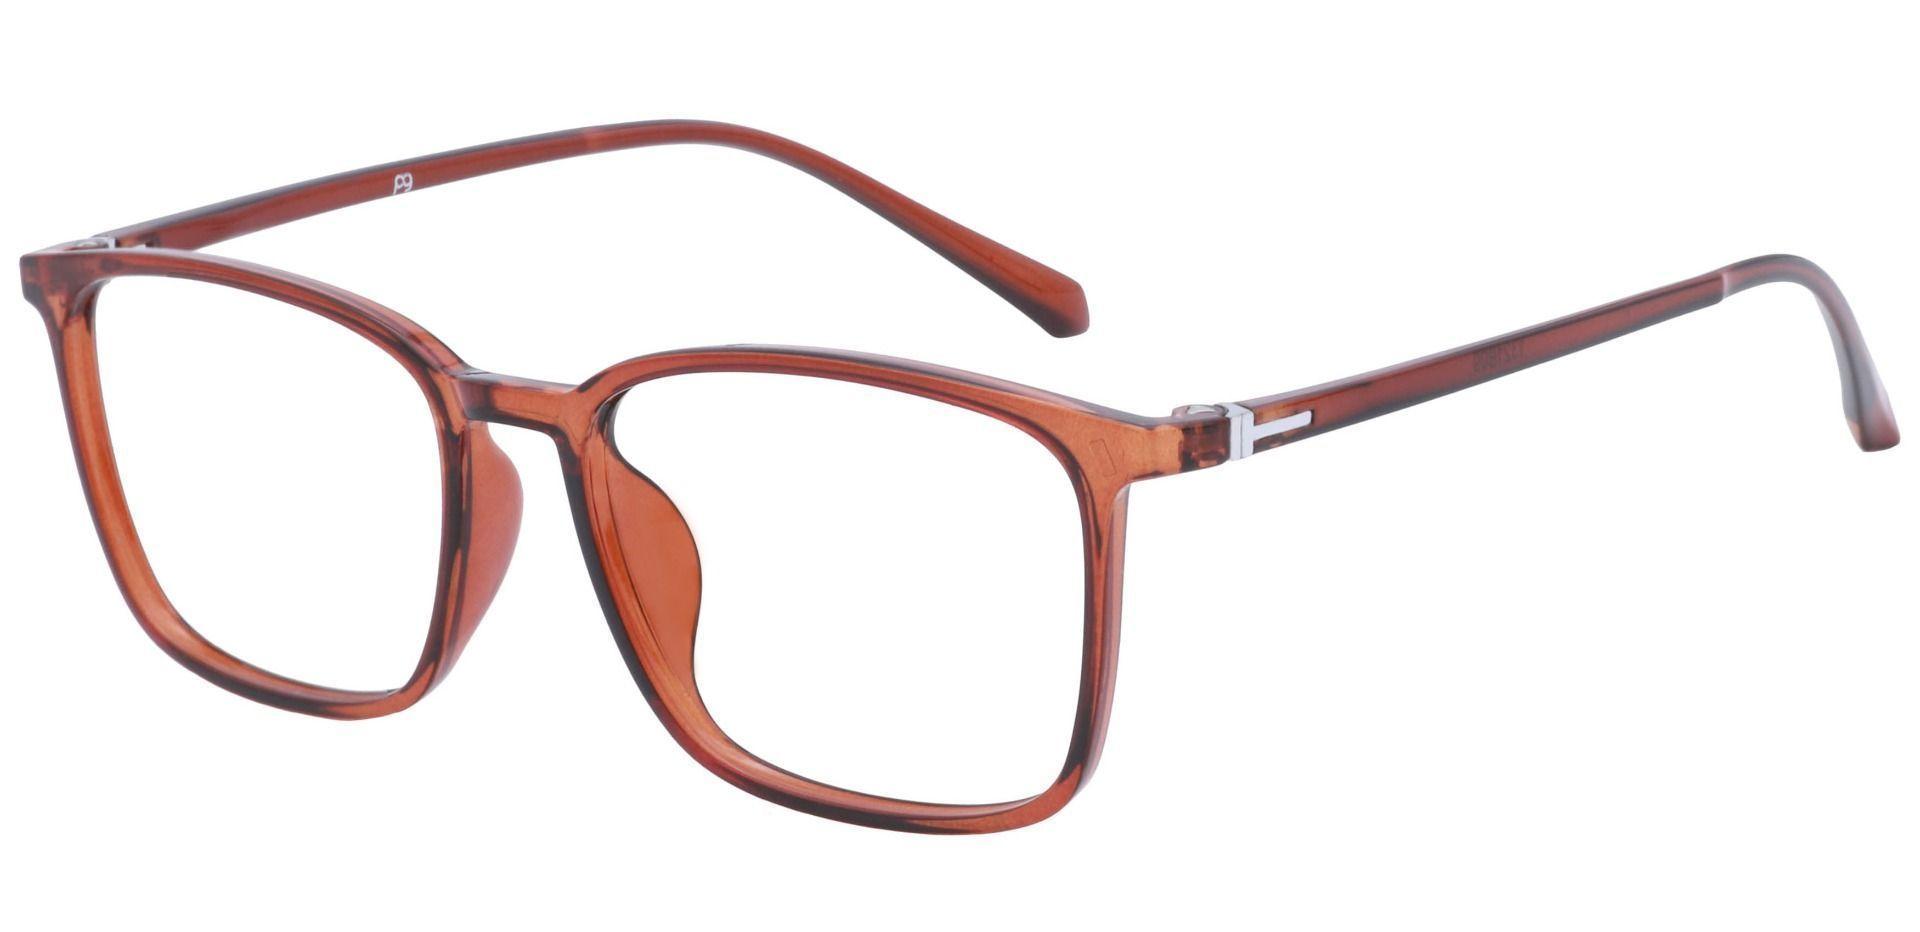 Hayworth Rectangle Blue Light Blocking Glasses - Brown